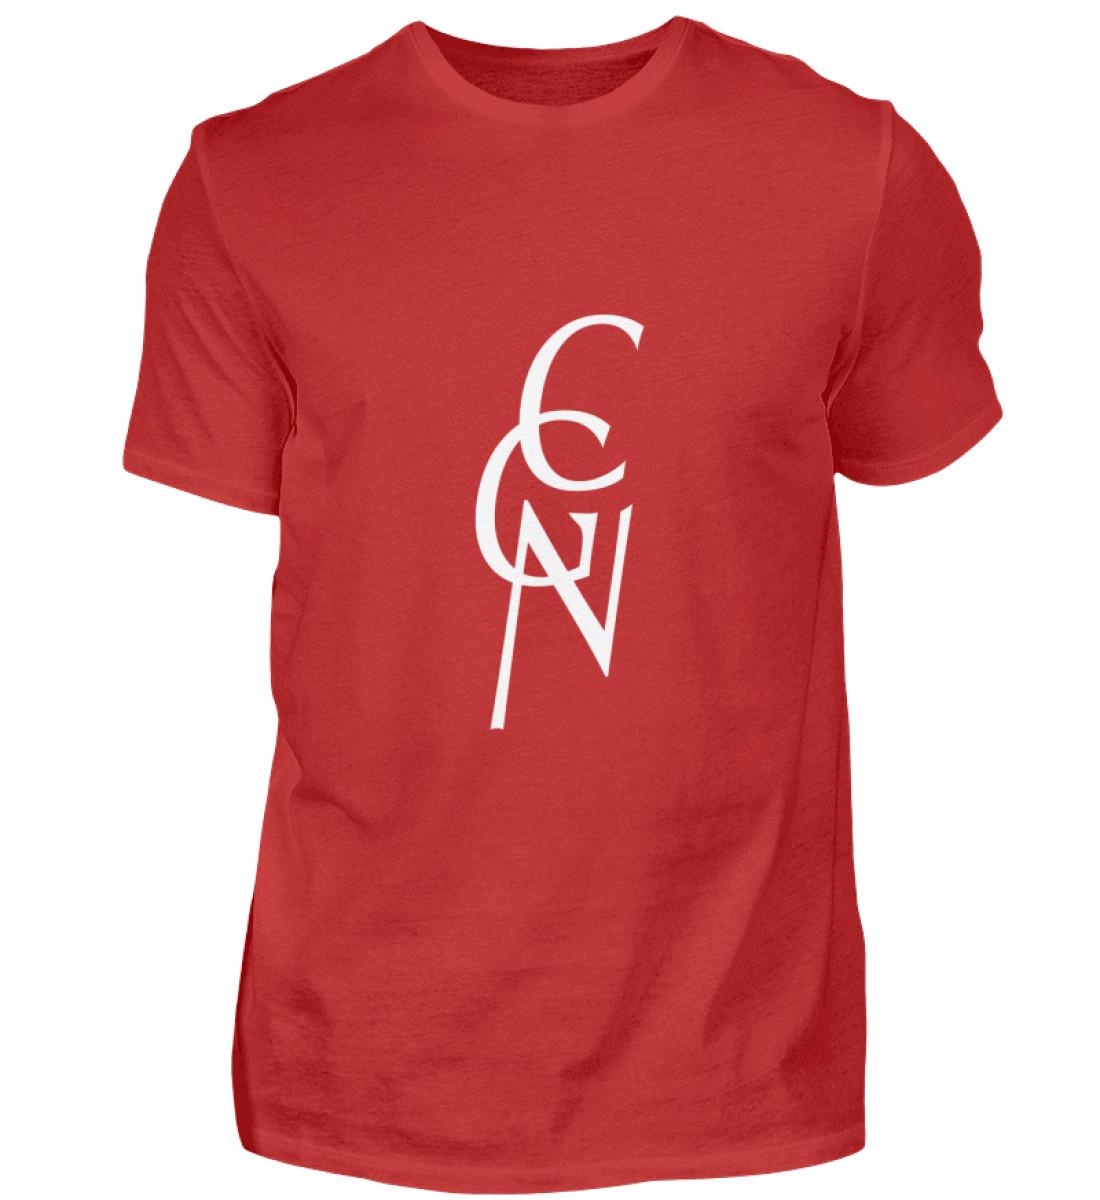 CGN - T-Shirt Herren - Herren Shirt-4